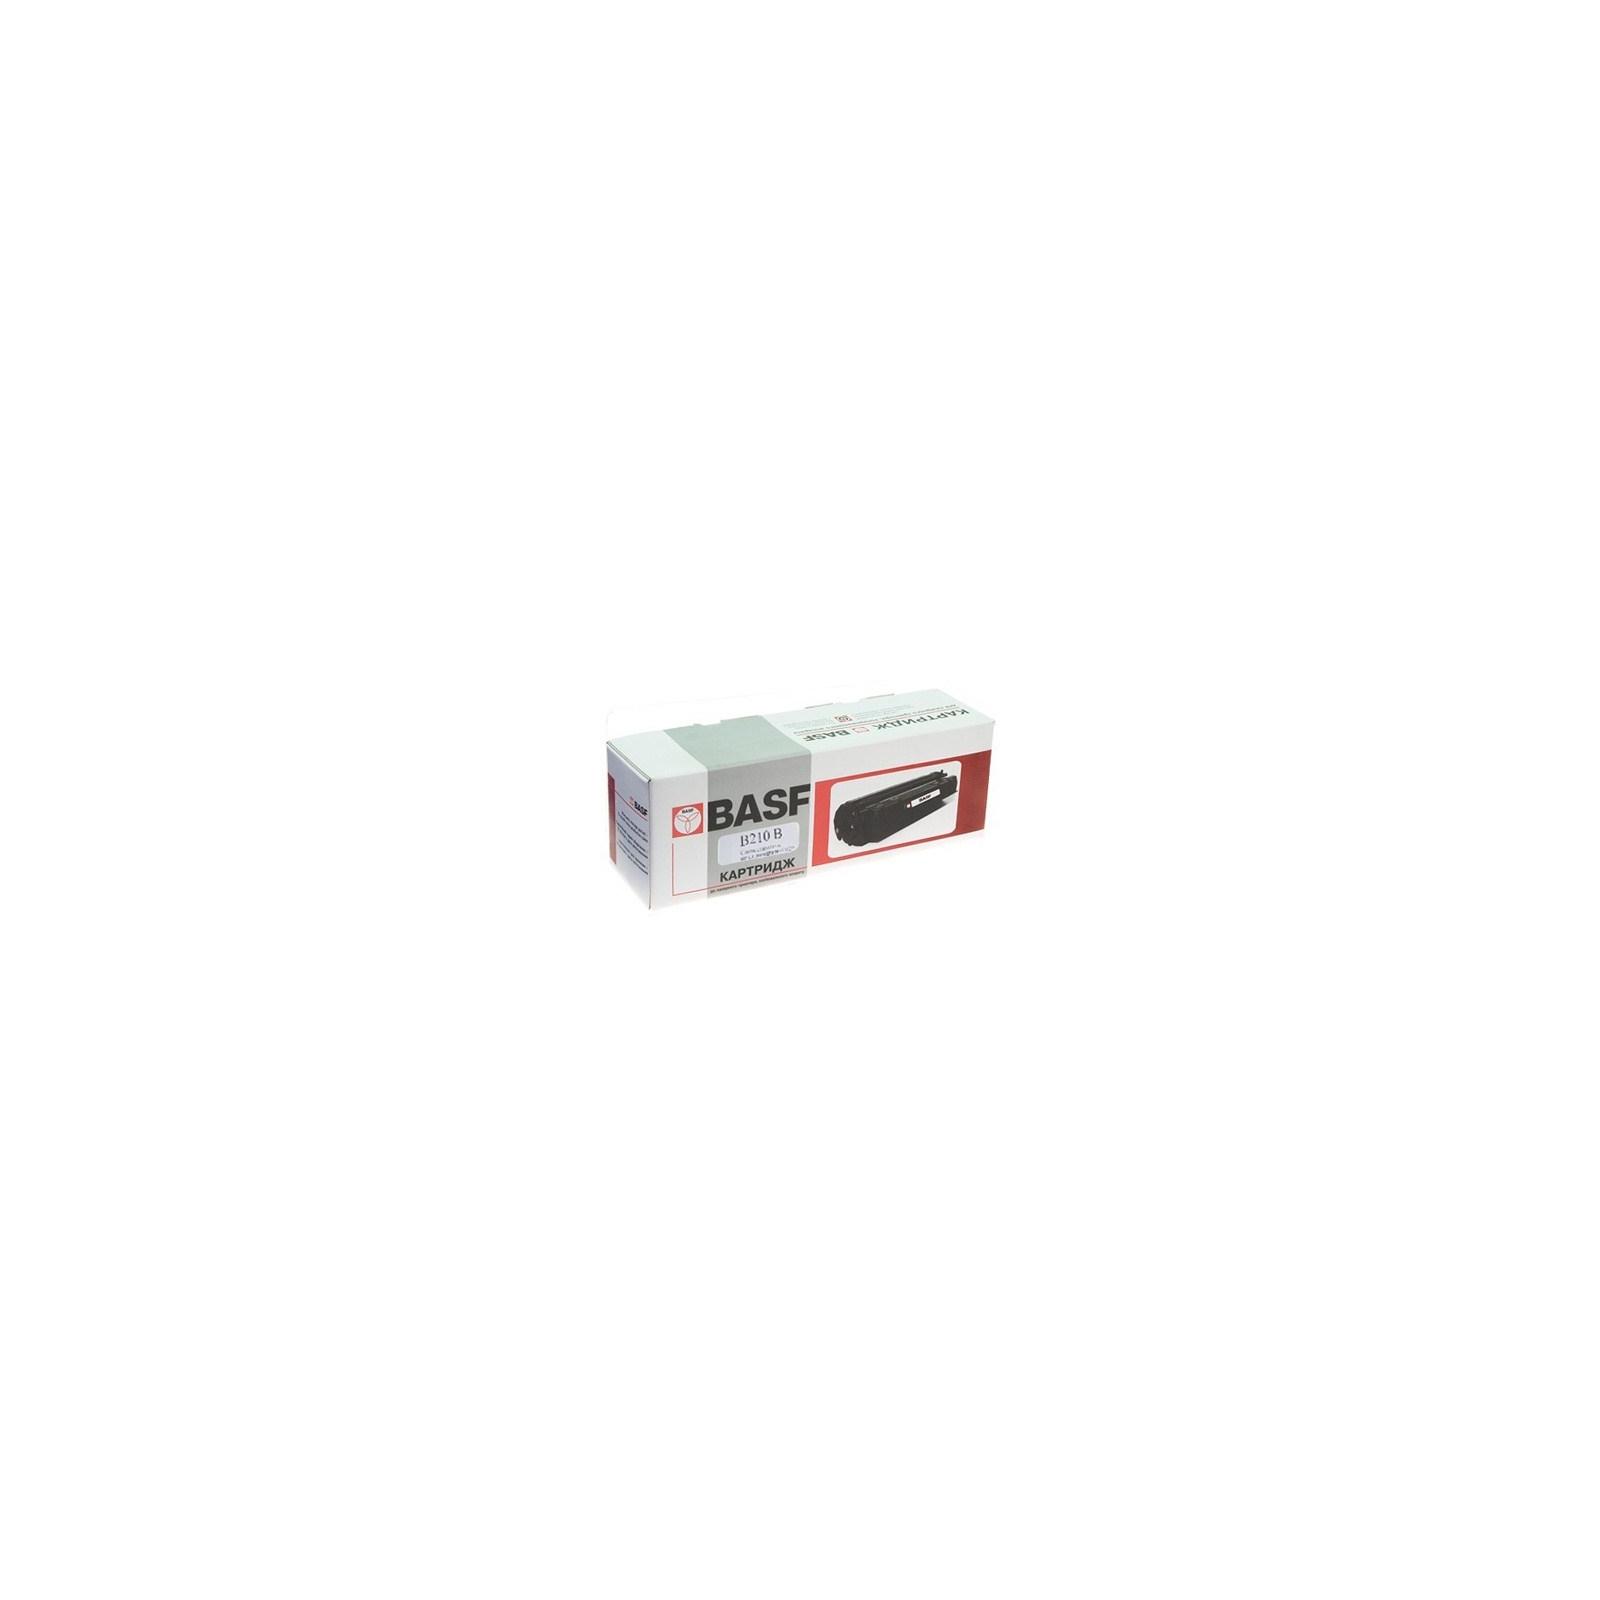 Картридж BASF для HP CLJ M276n/nw M251n/nw Black (B210)